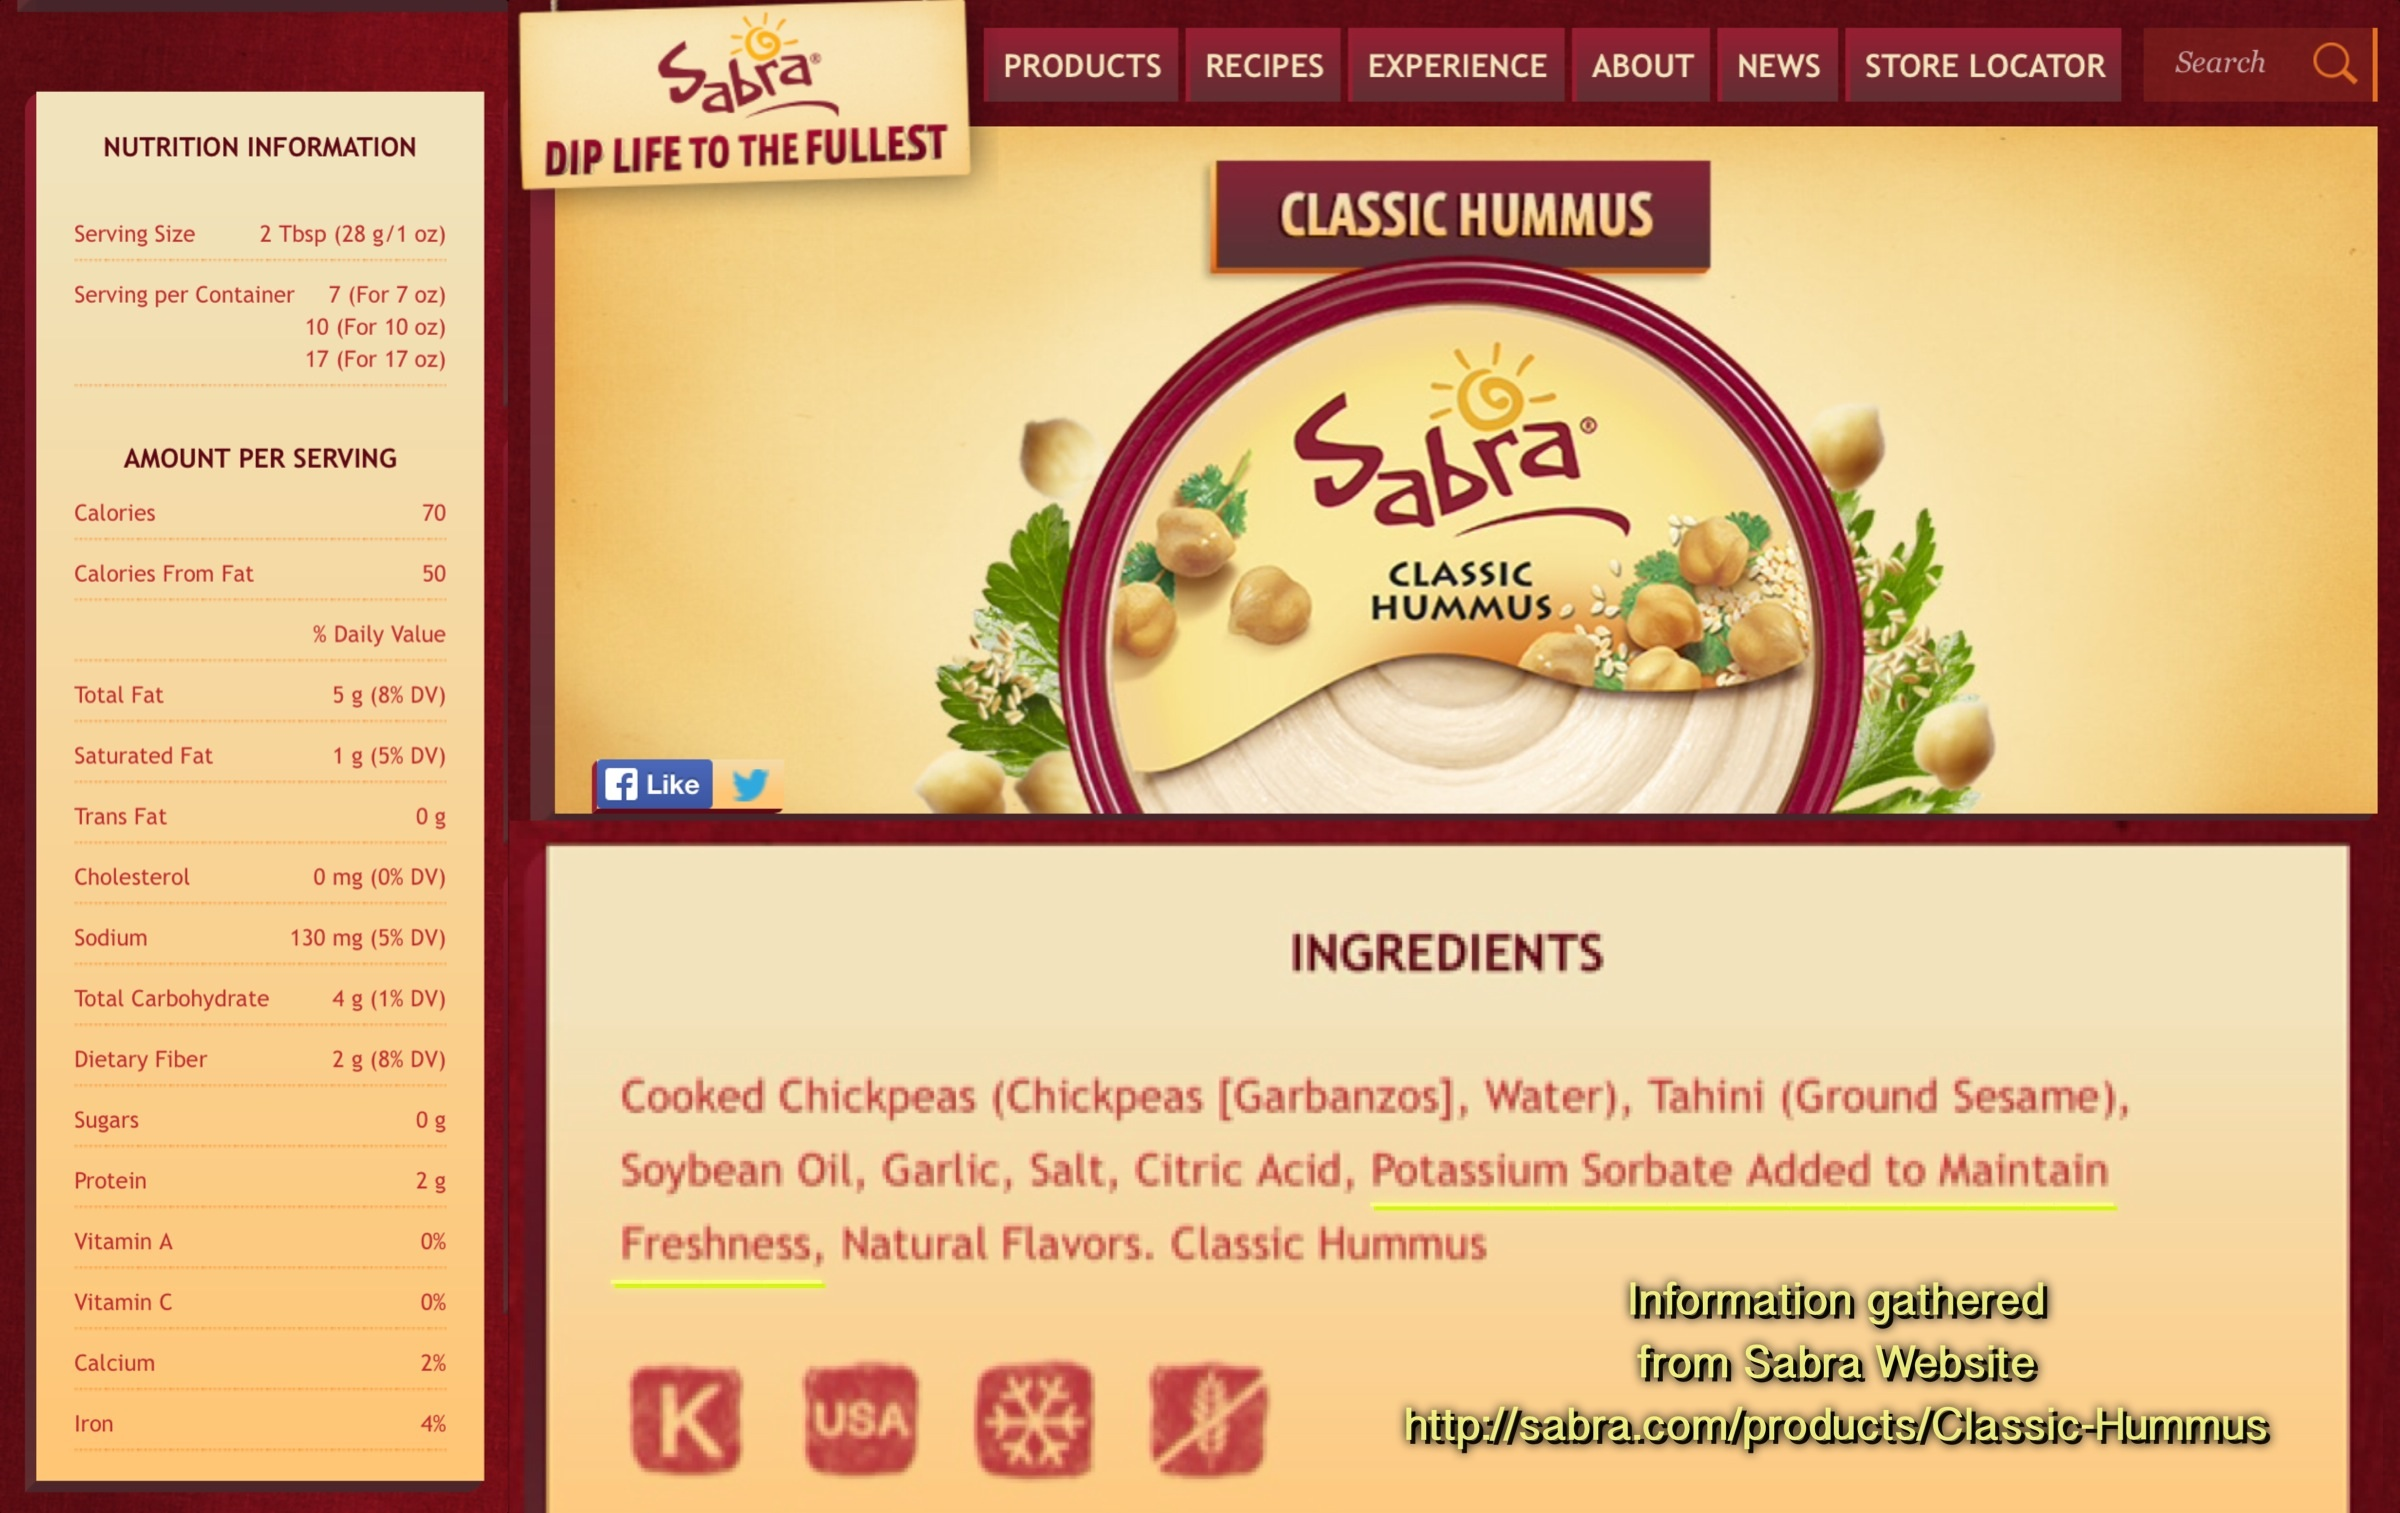 Hummus nutrients : Best edible oil for heart